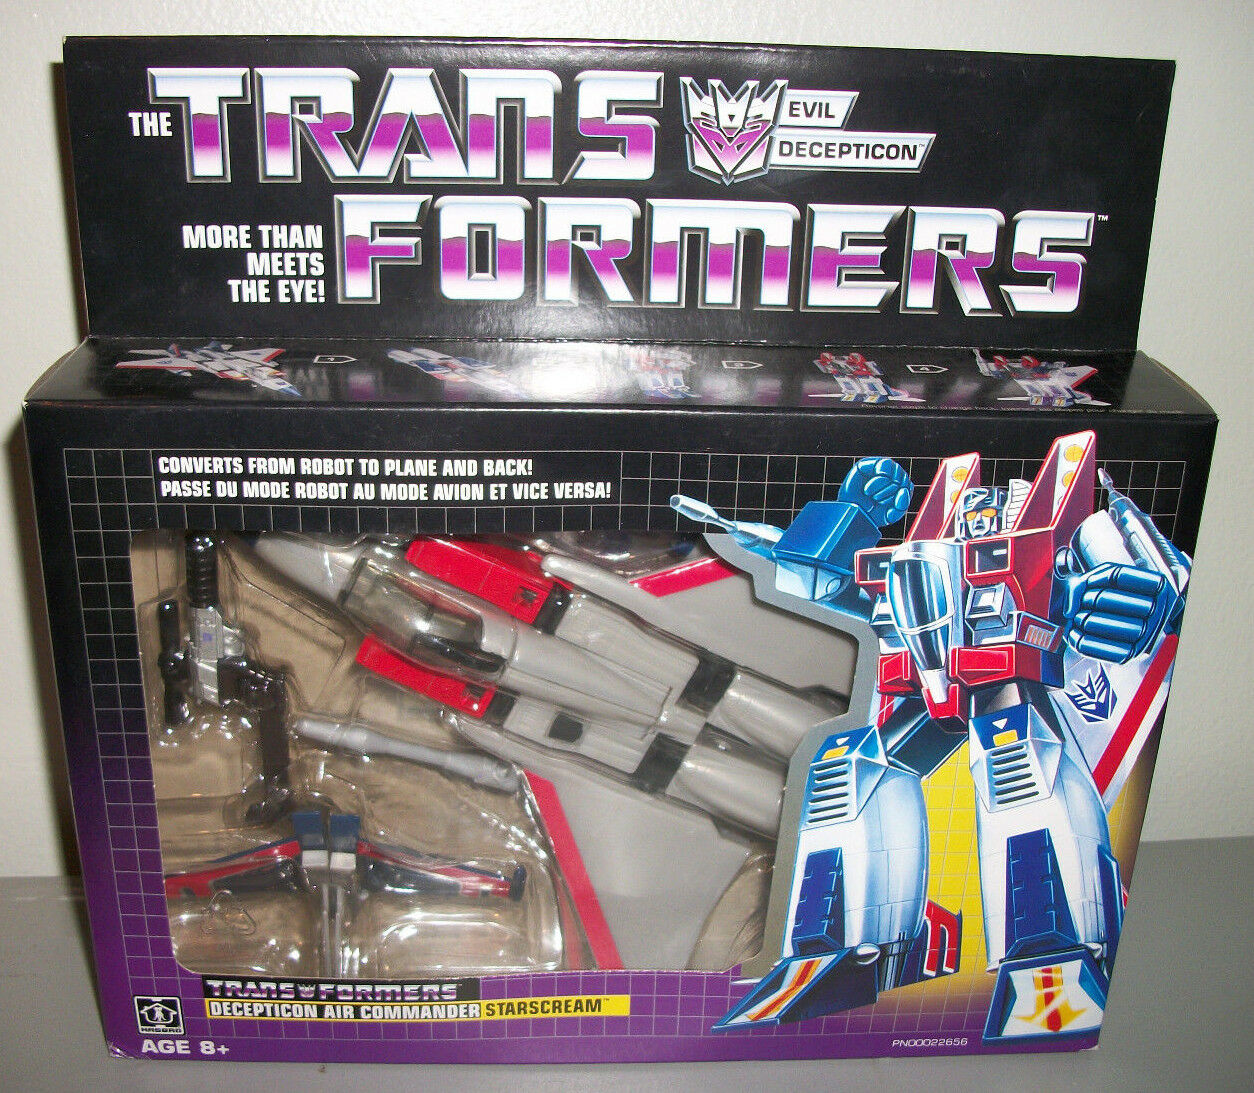 G1 transformers walmart neuauflage starscream new in box 2018